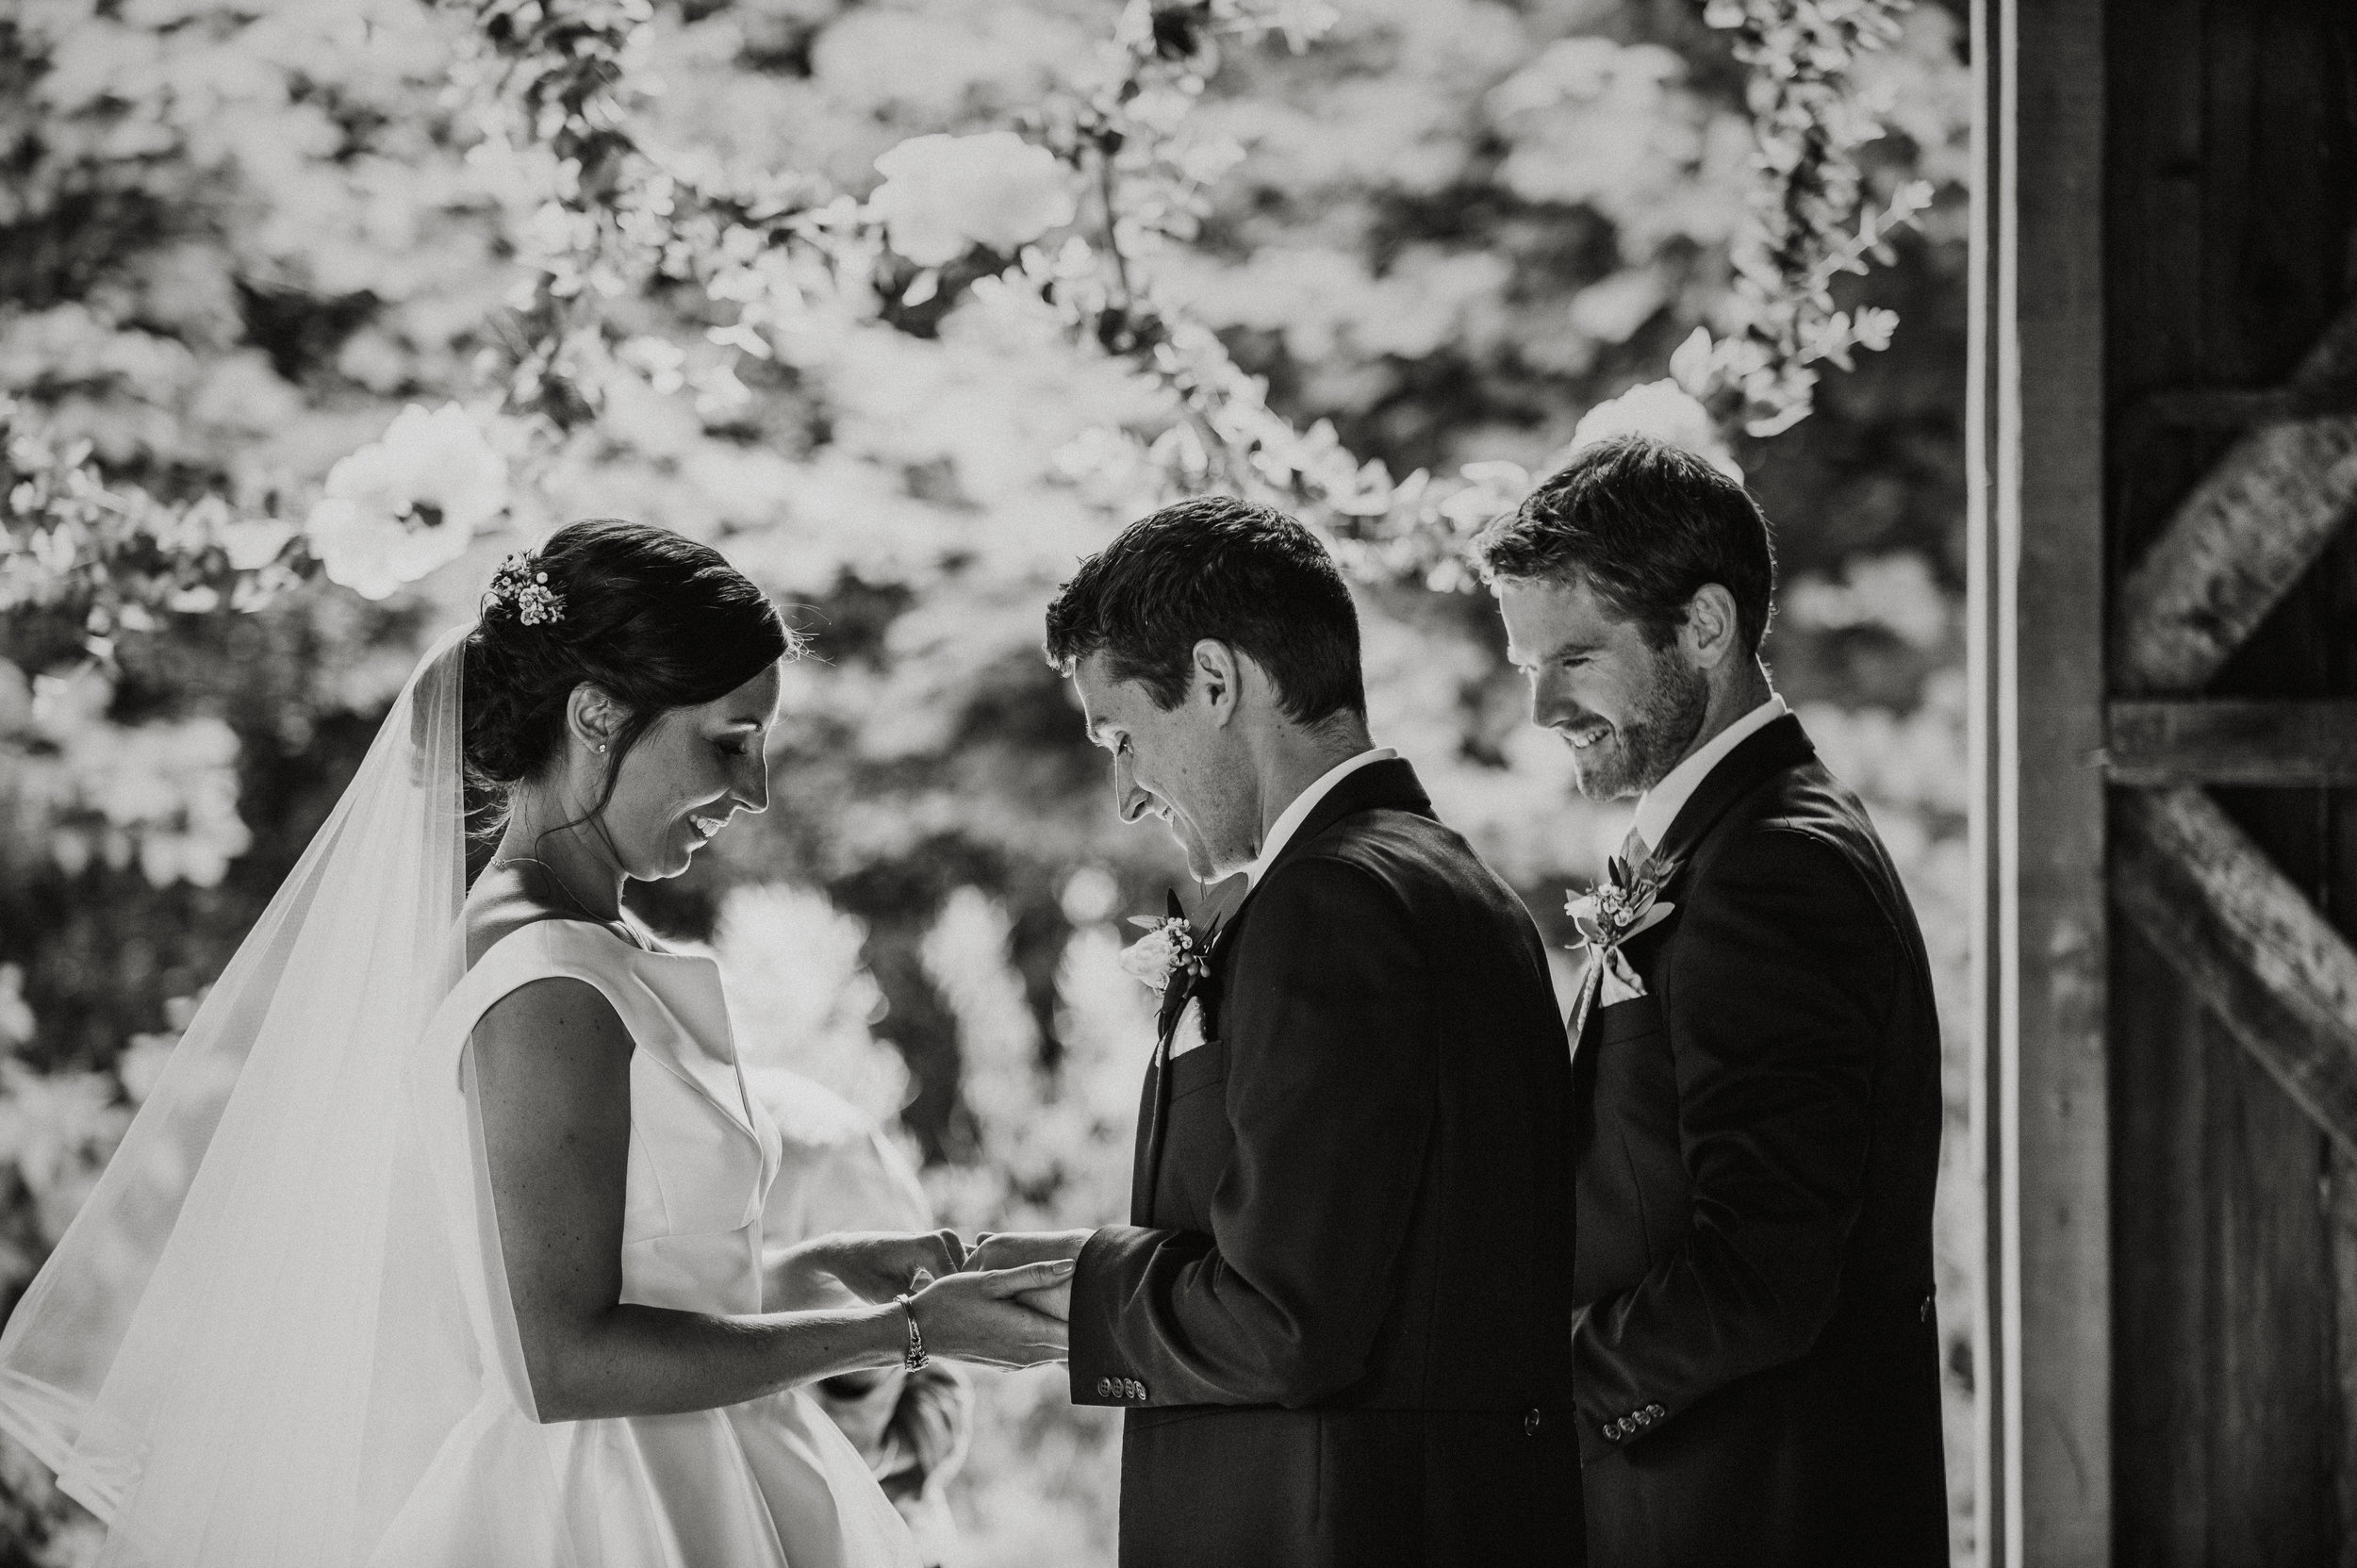 nancarrow-farm-wedding-photographer-cornwall-14.jpg